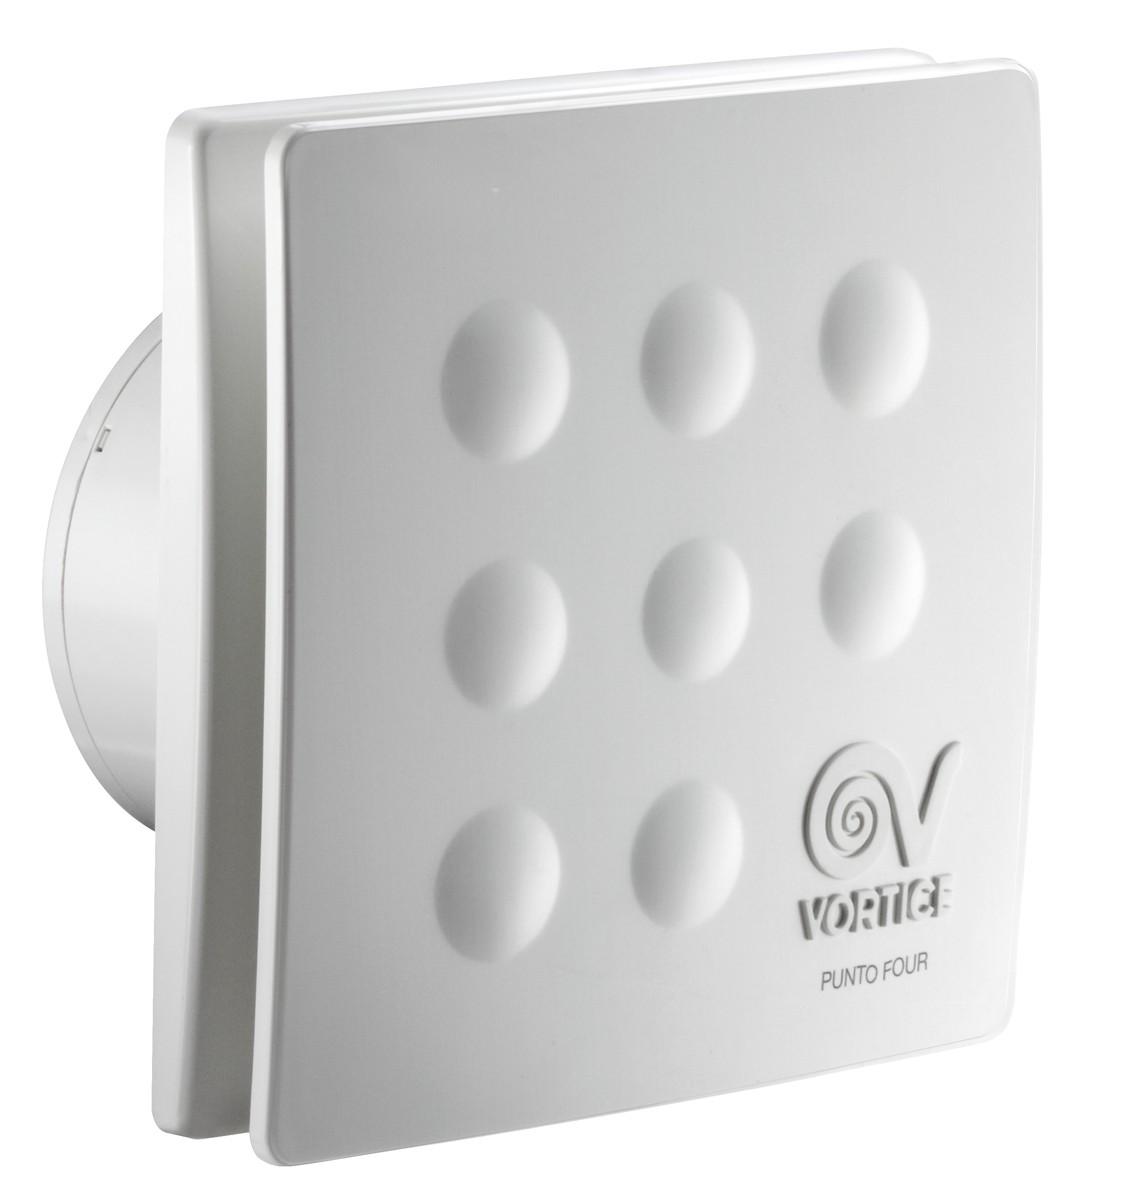 Bathroom Fan Small Room Punto Four Mfo 120 175m³ H